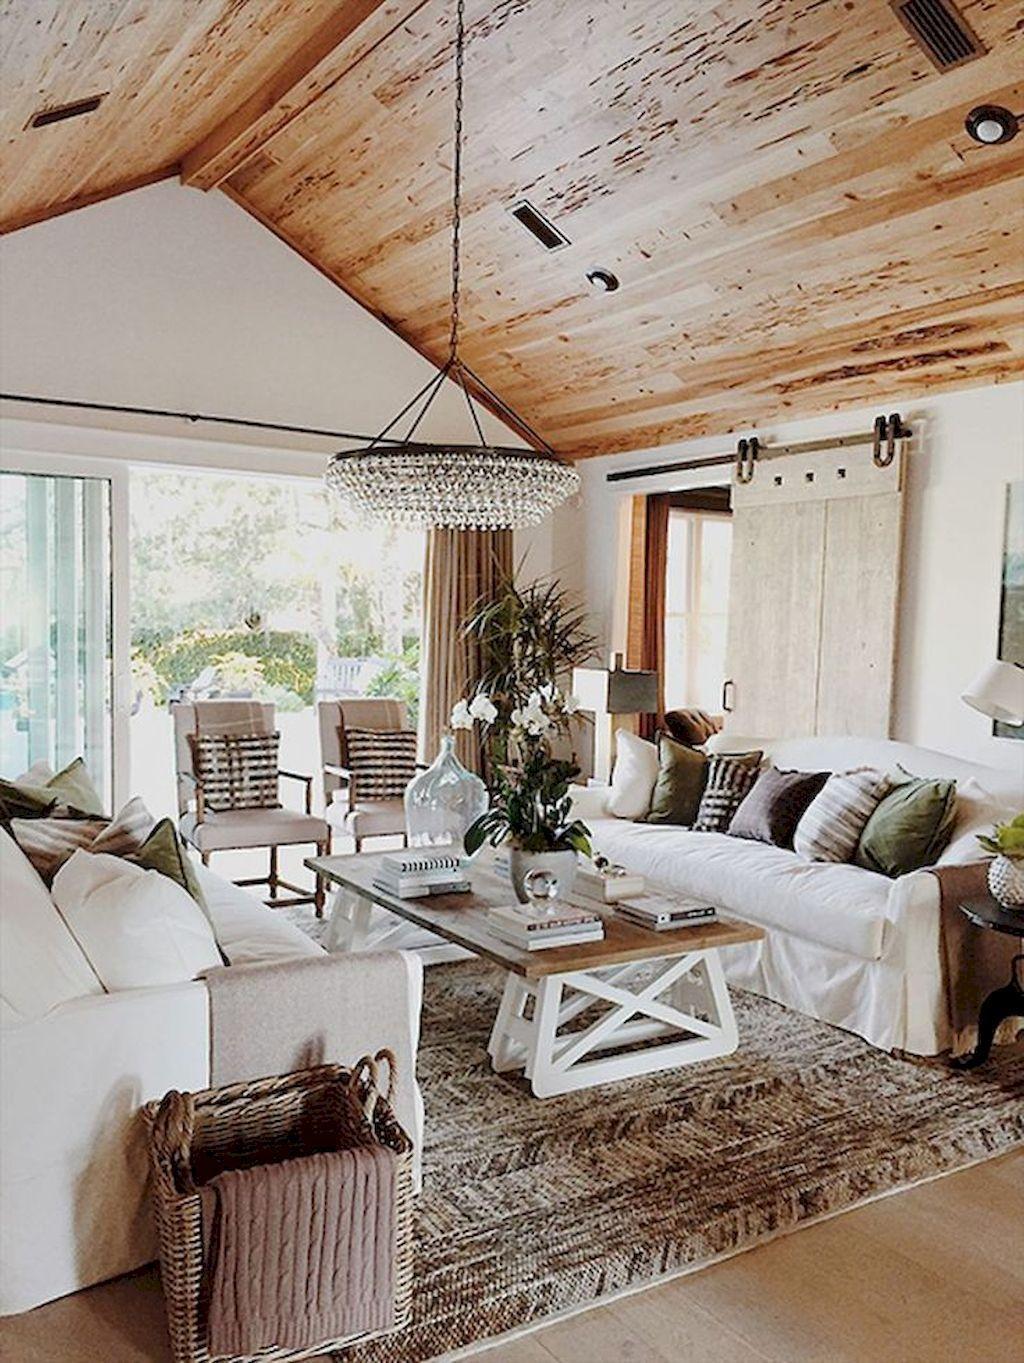 14 cozy modern farmhouse living room decor ideas on modern farmhouse living room design and decor inspirations country farmhouse furniture id=86119